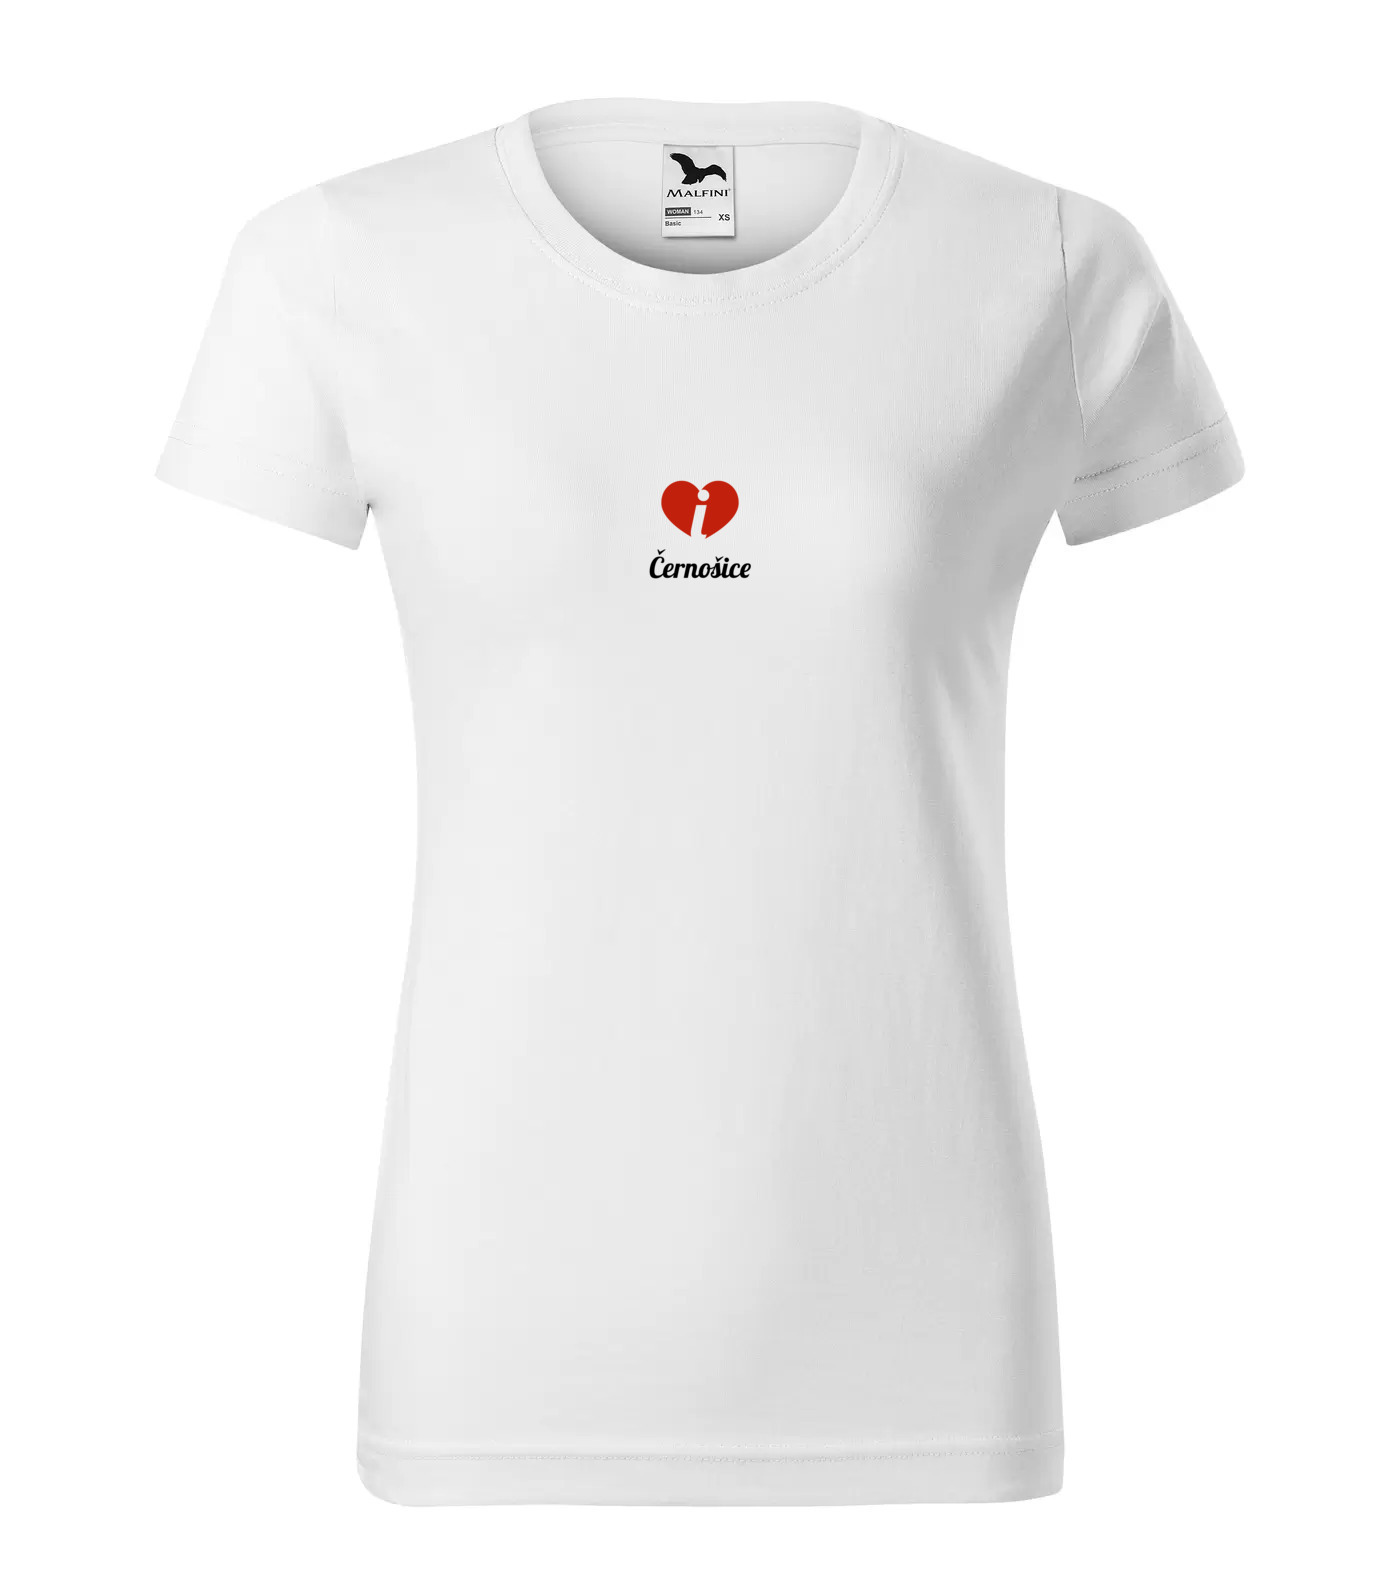 Tričko Černošice